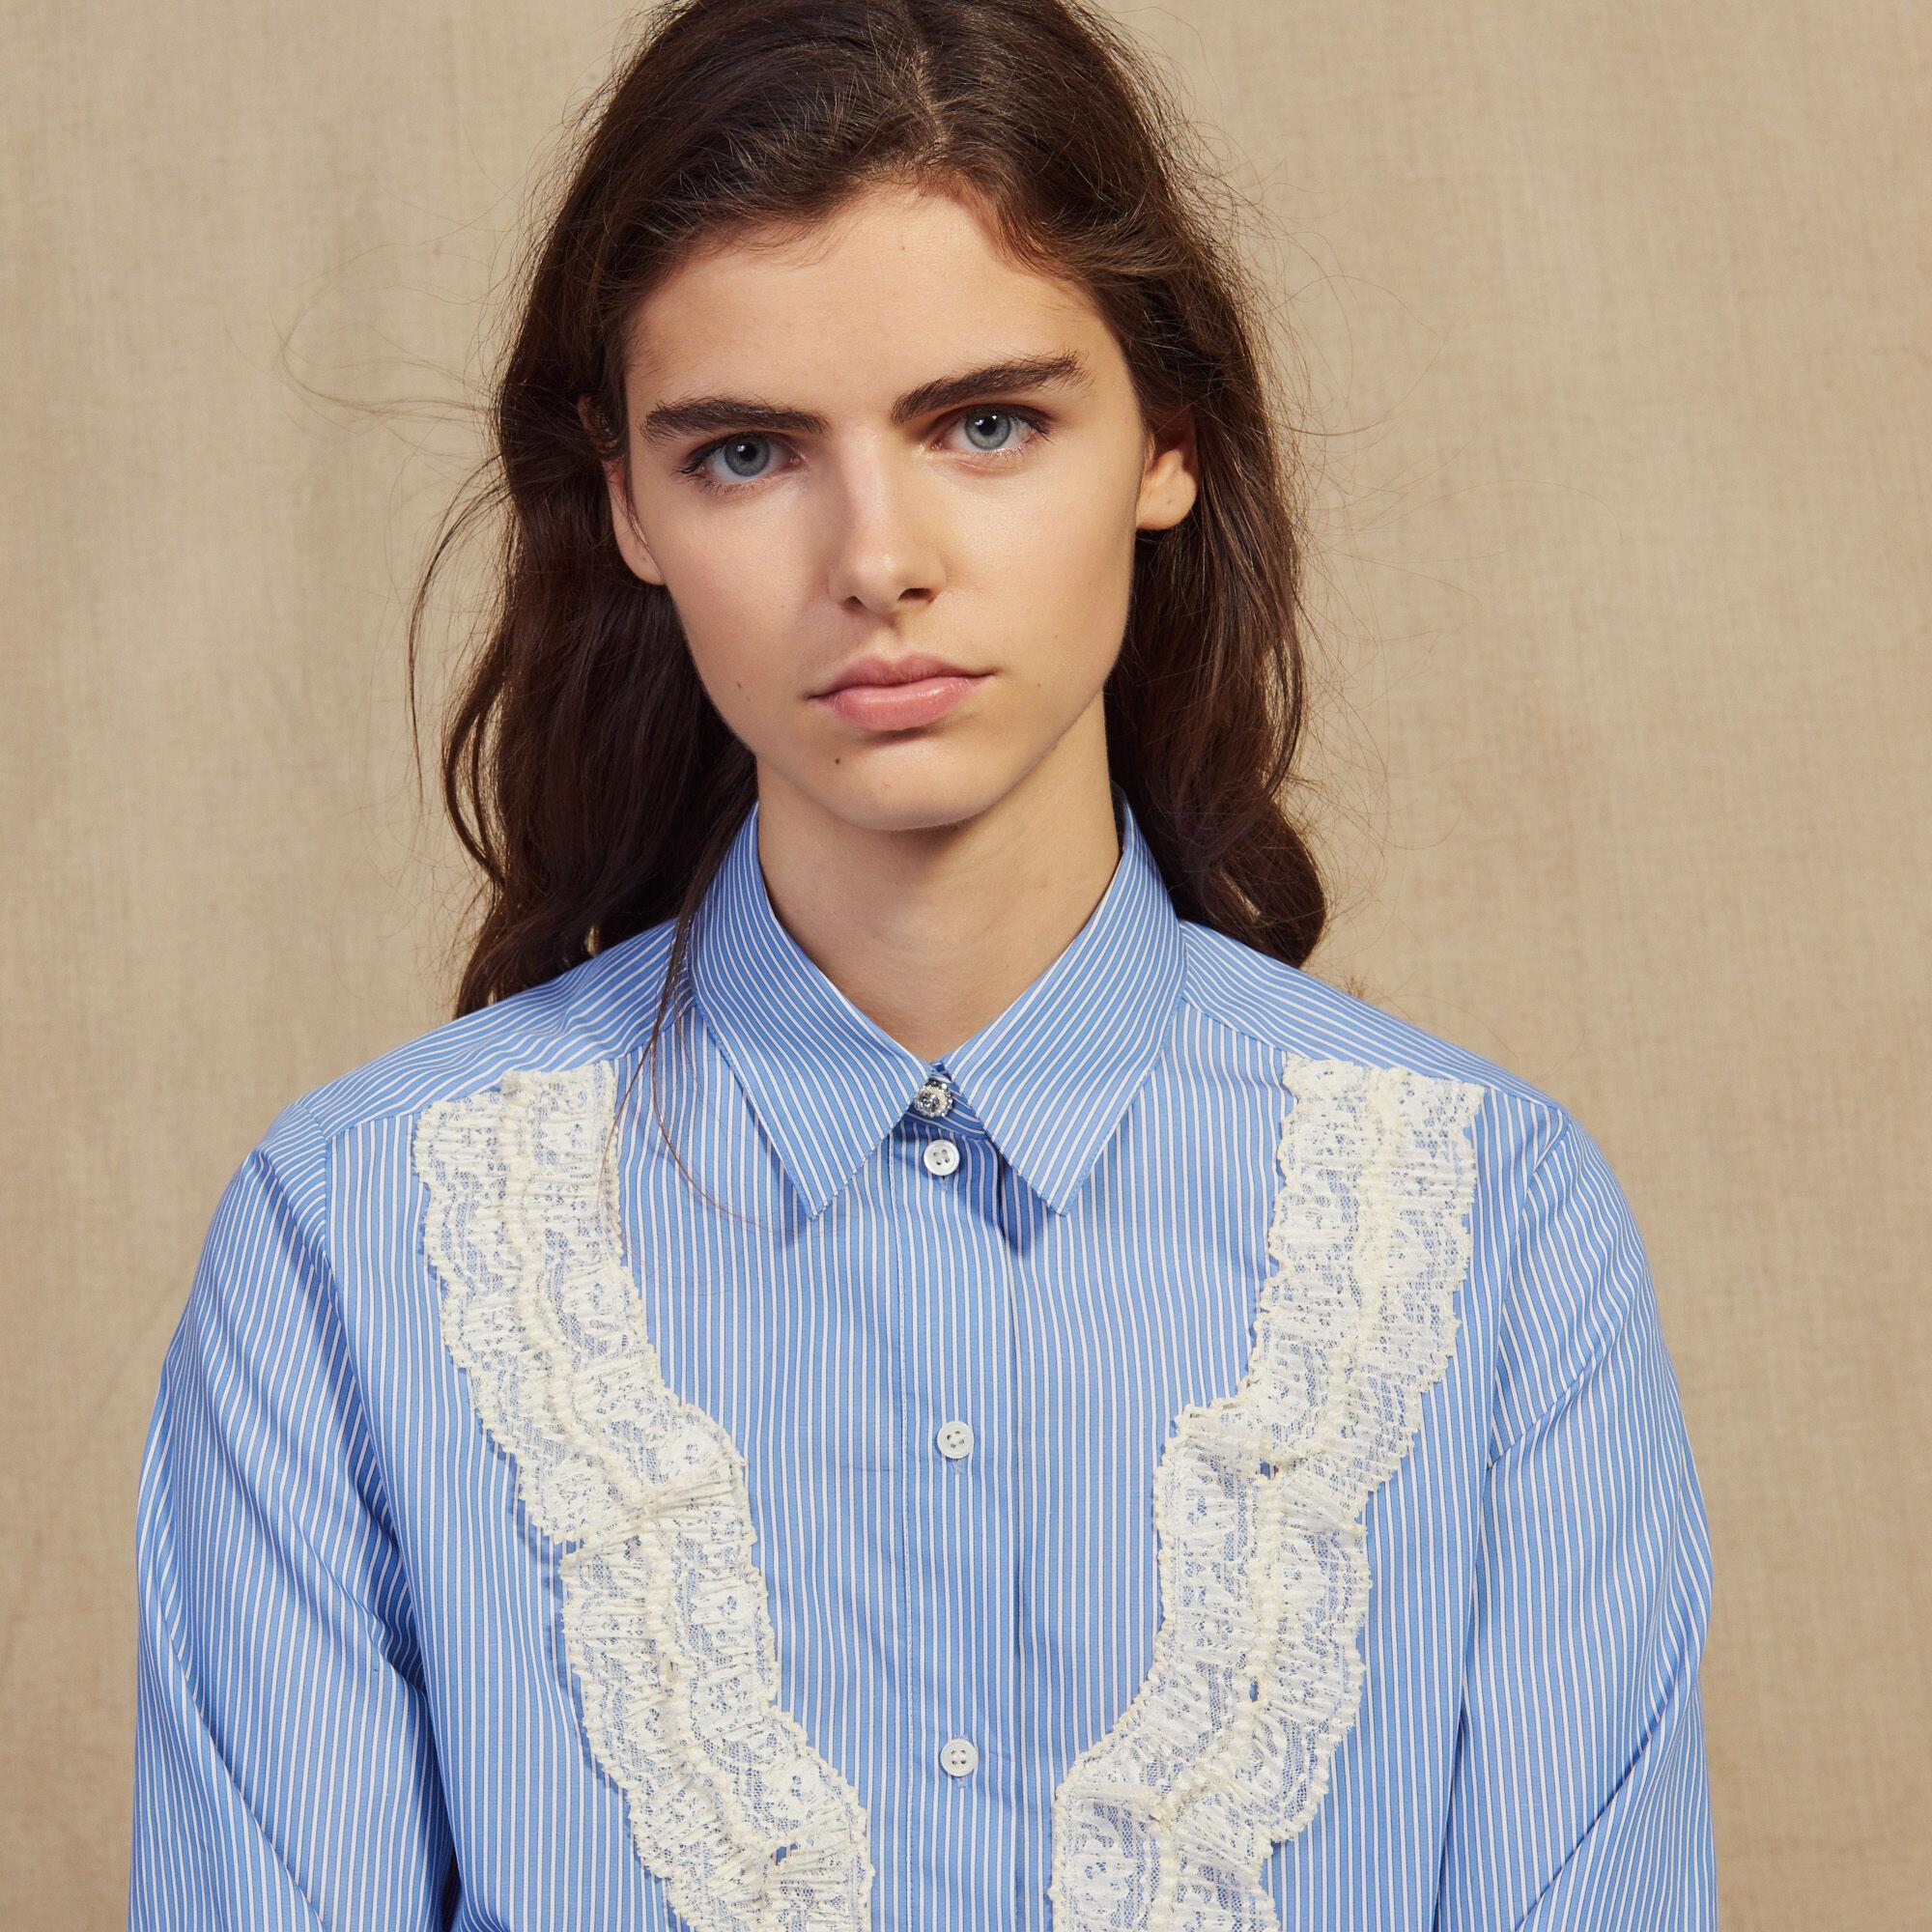 Chemise à fines rayures avec dentelle